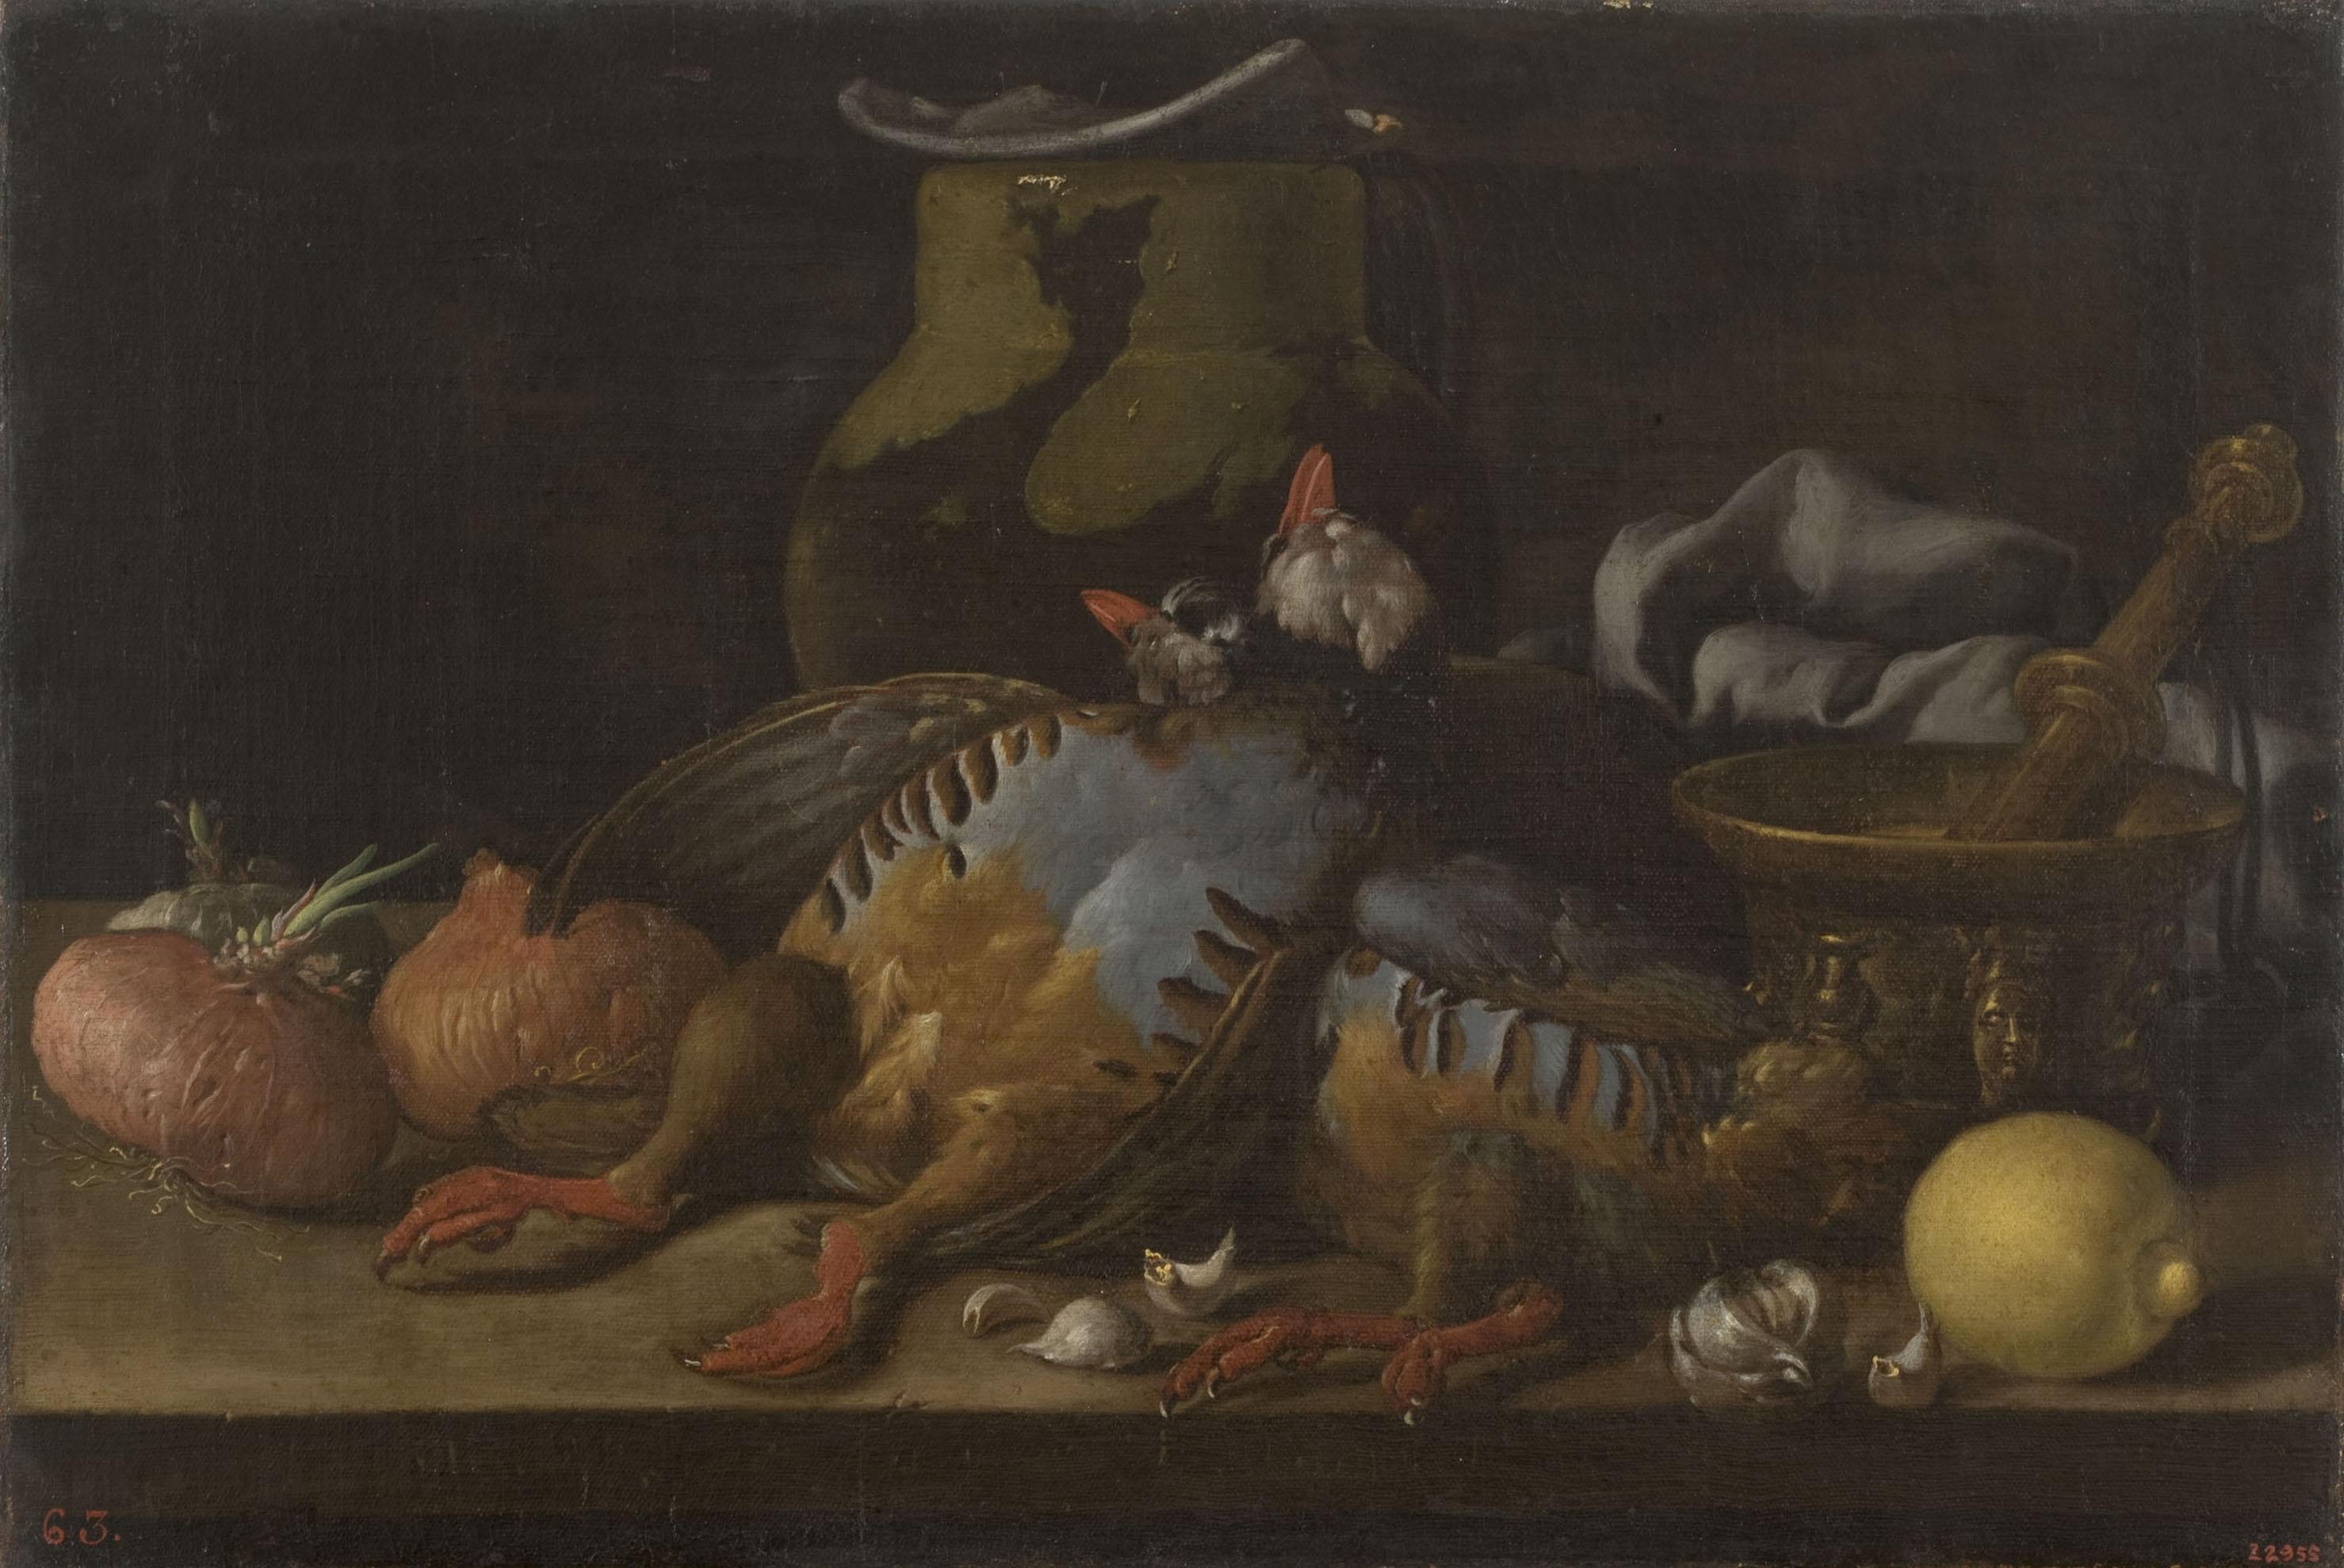 Luis Egidio Meléndez - Still Life with Partridges, Onions, Lemon and Kitchen Utensils - Circa 1773-1780